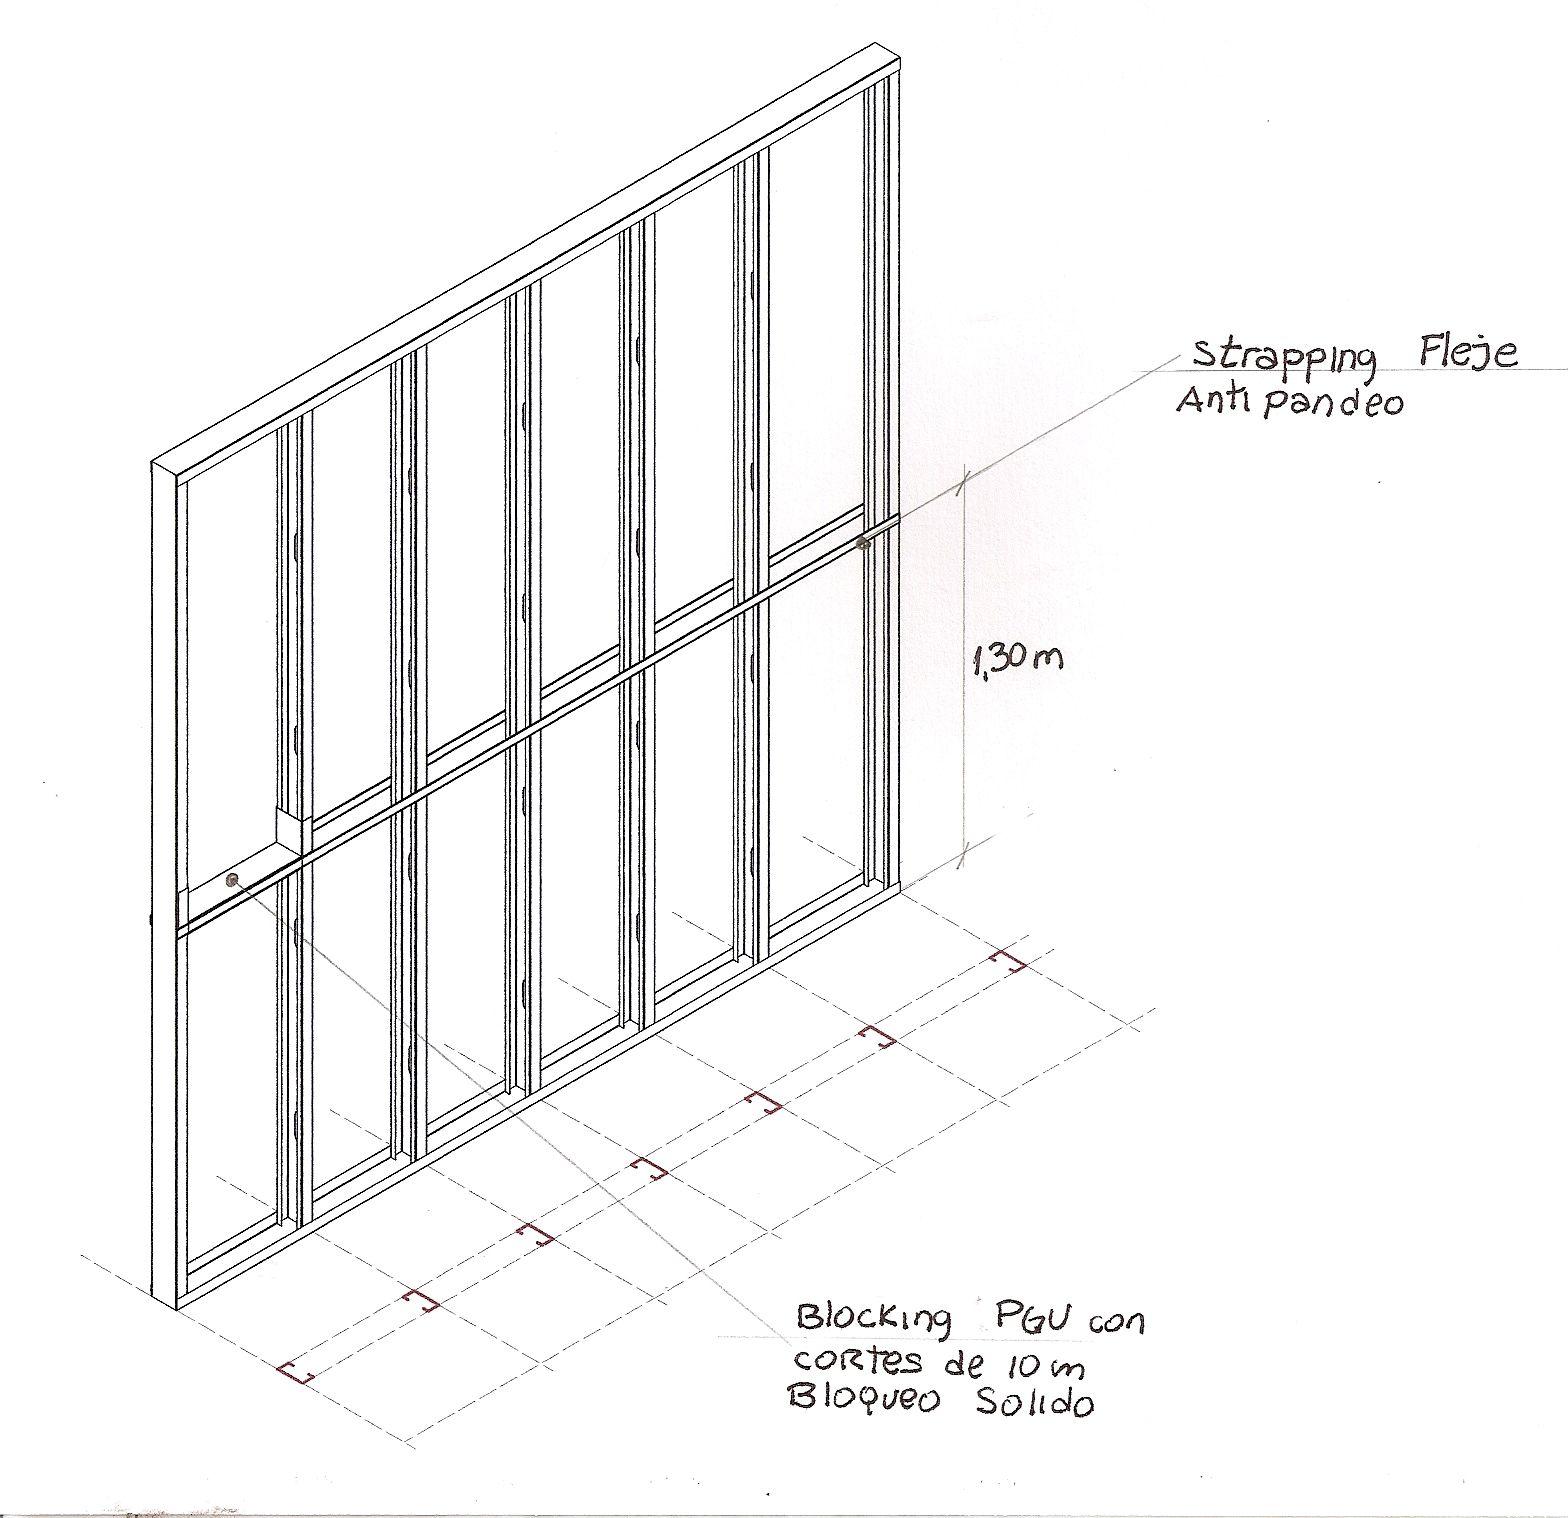 Light Steel Framing Diagram Lsf Architecture Pinterestcom